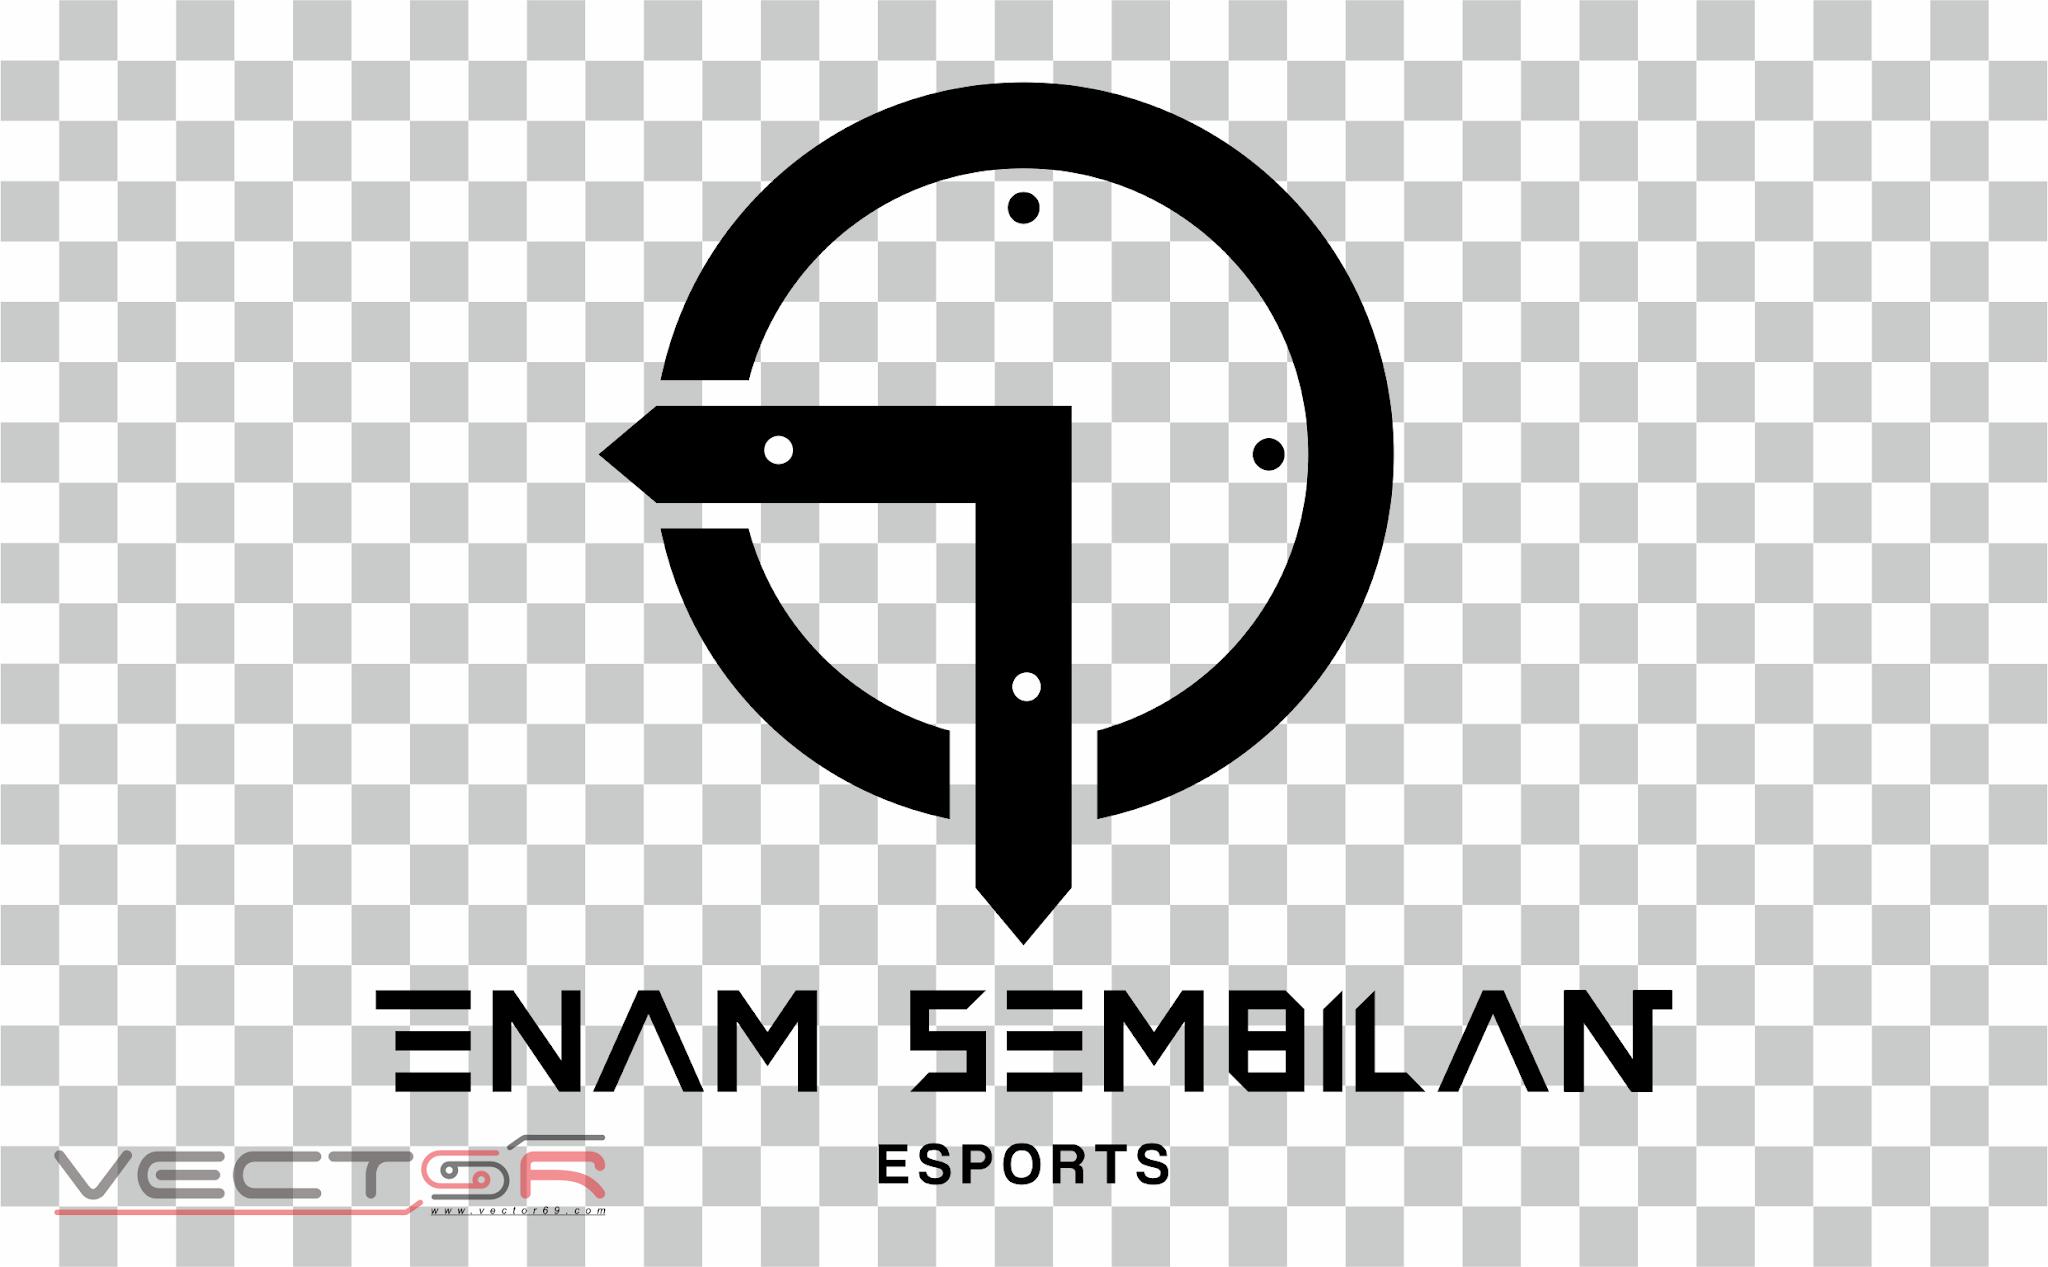 Enam Sembilan Esports Logo - Download Vector File PNG (Portable Network Graphics)